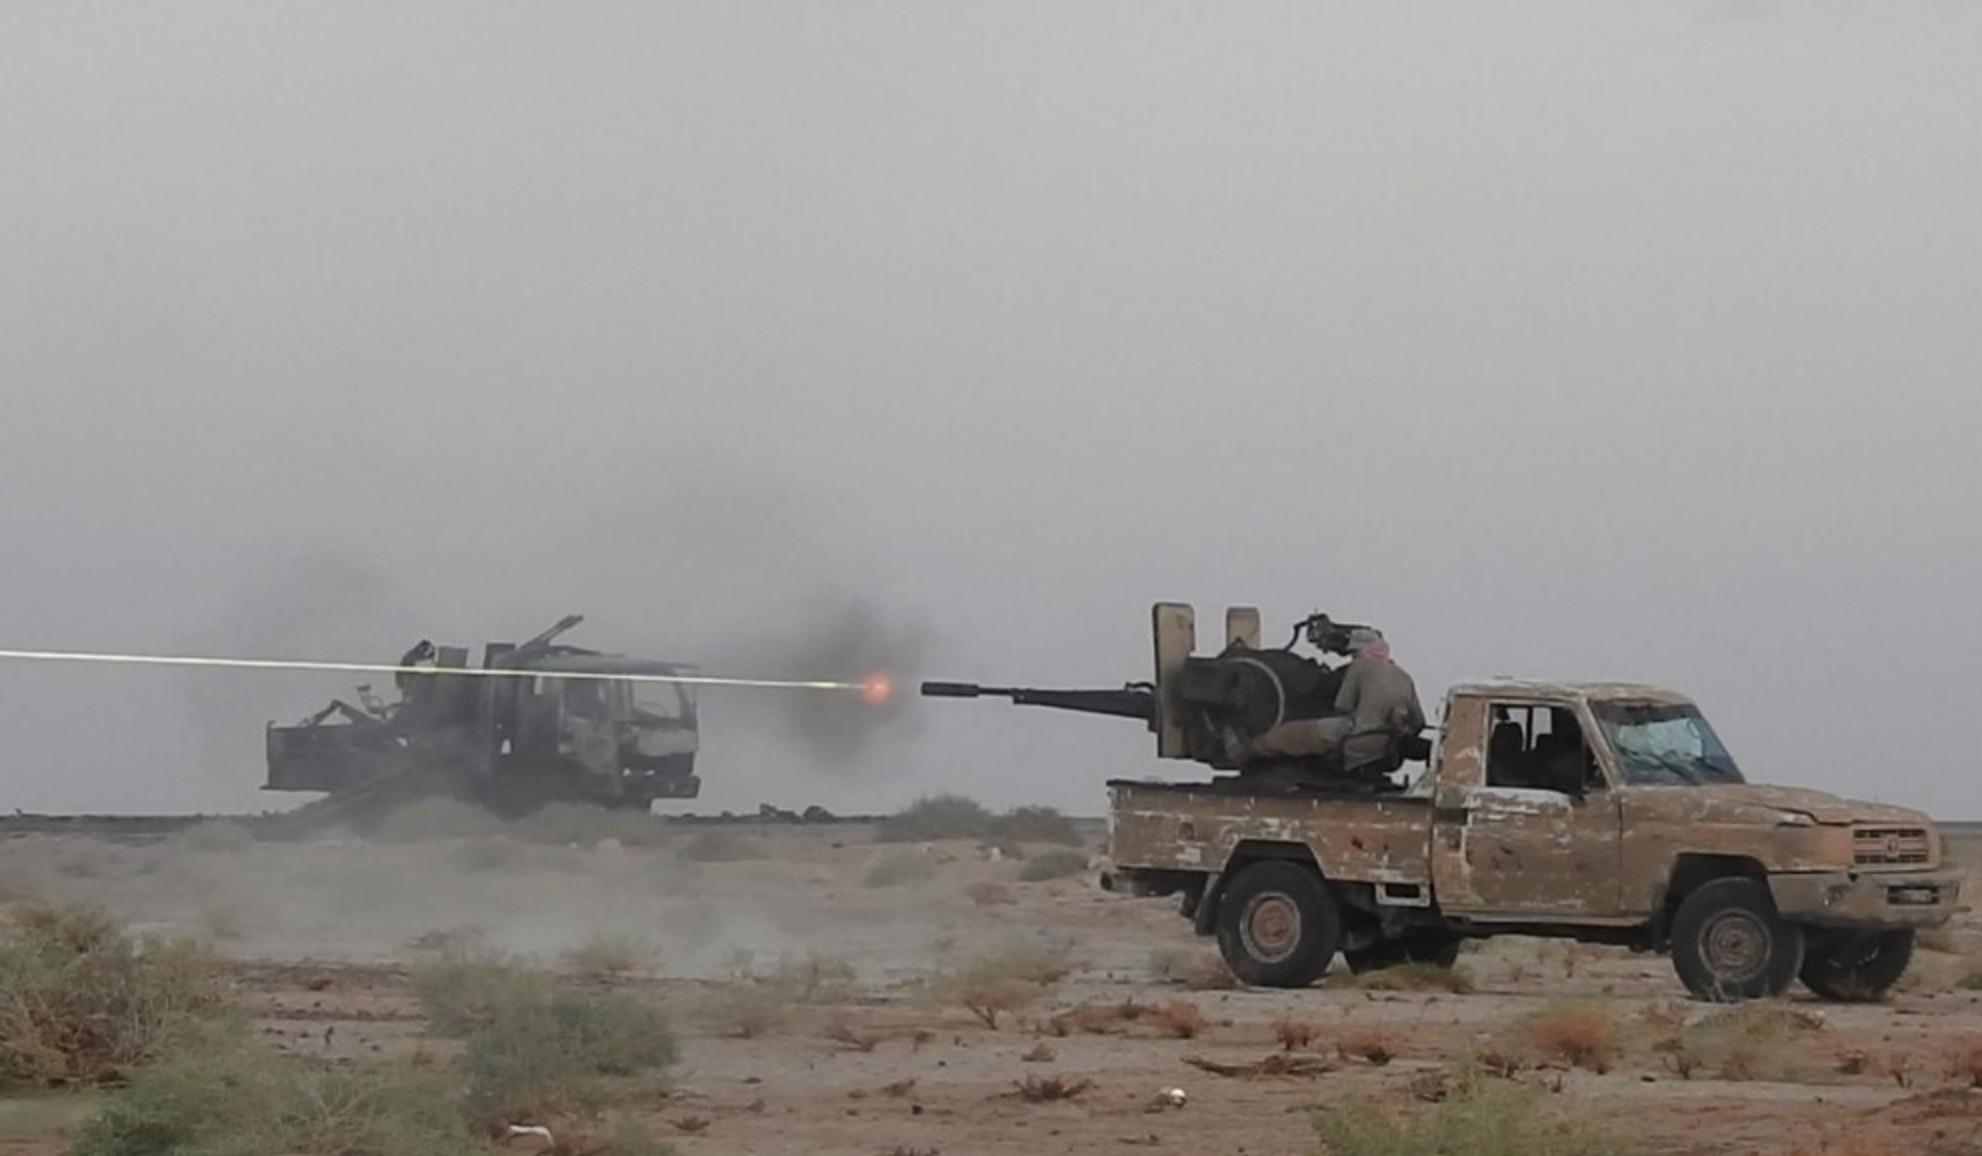 Rejim güçleri Humus'ta IŞİD'e karşı büyük kayıp verdi